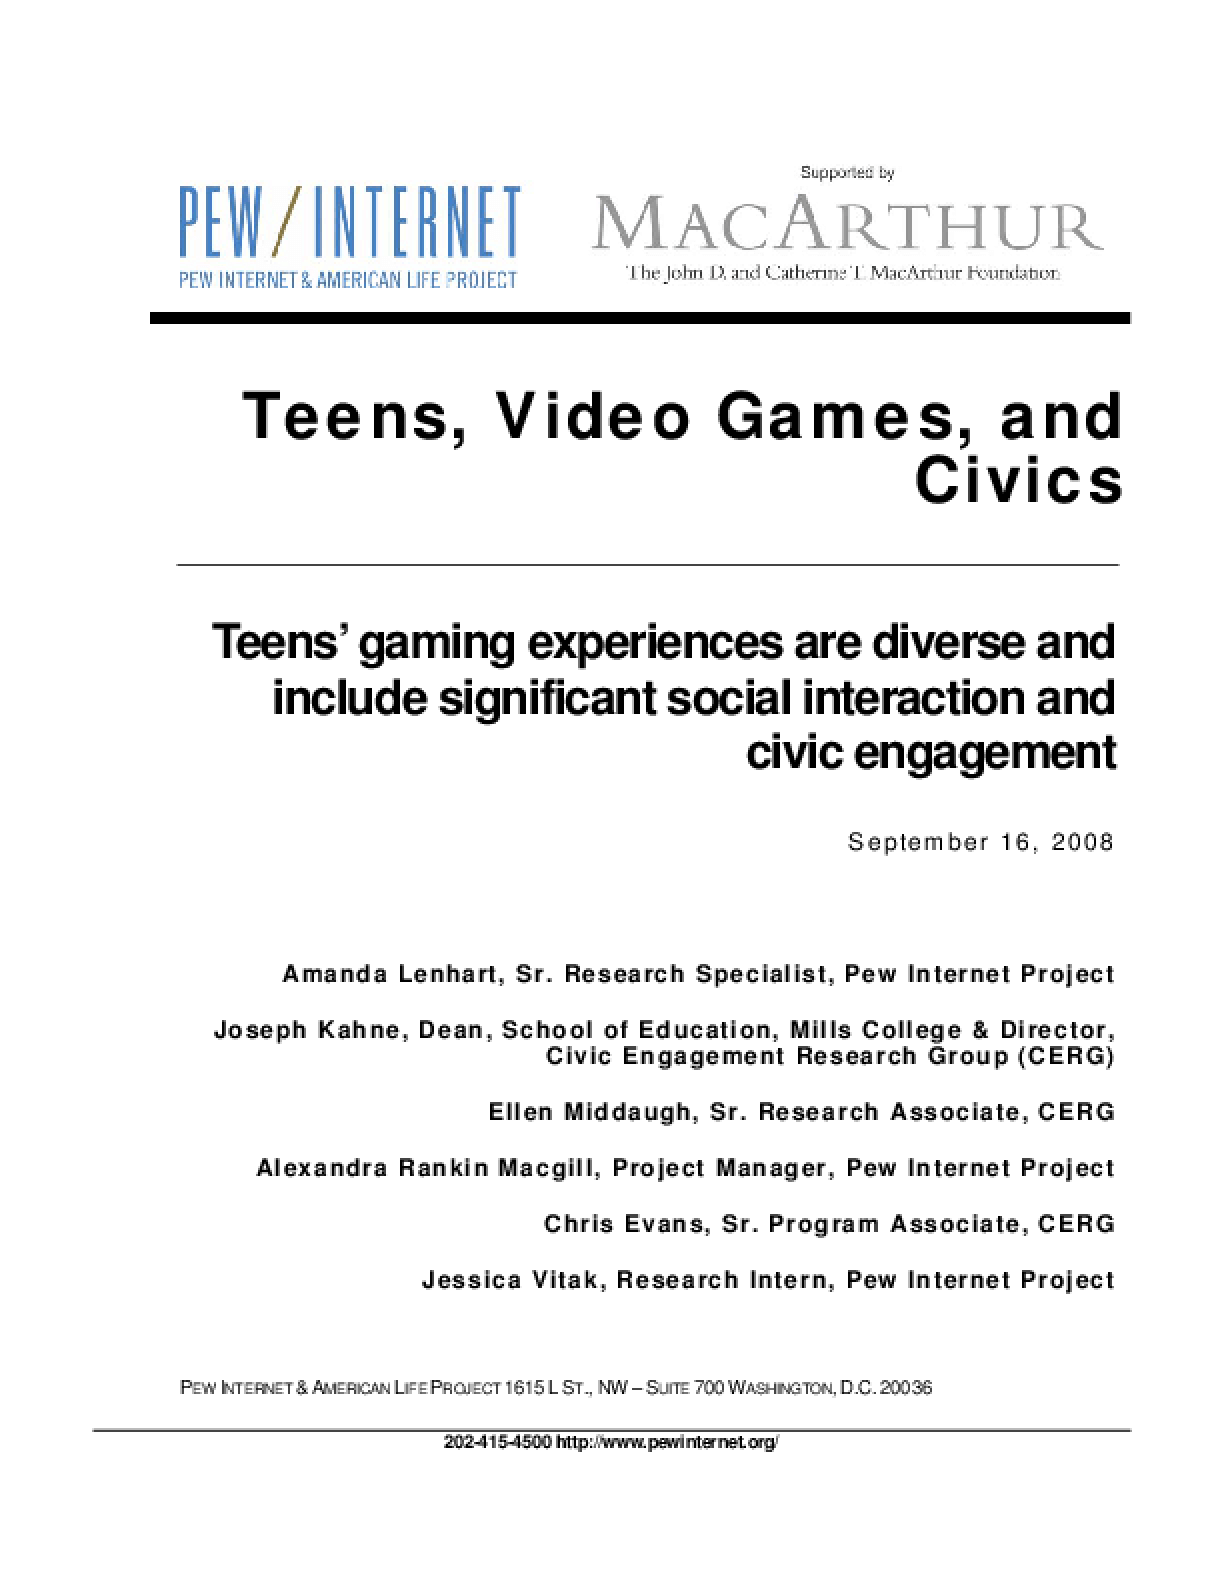 Teens, Video Games, and Civics